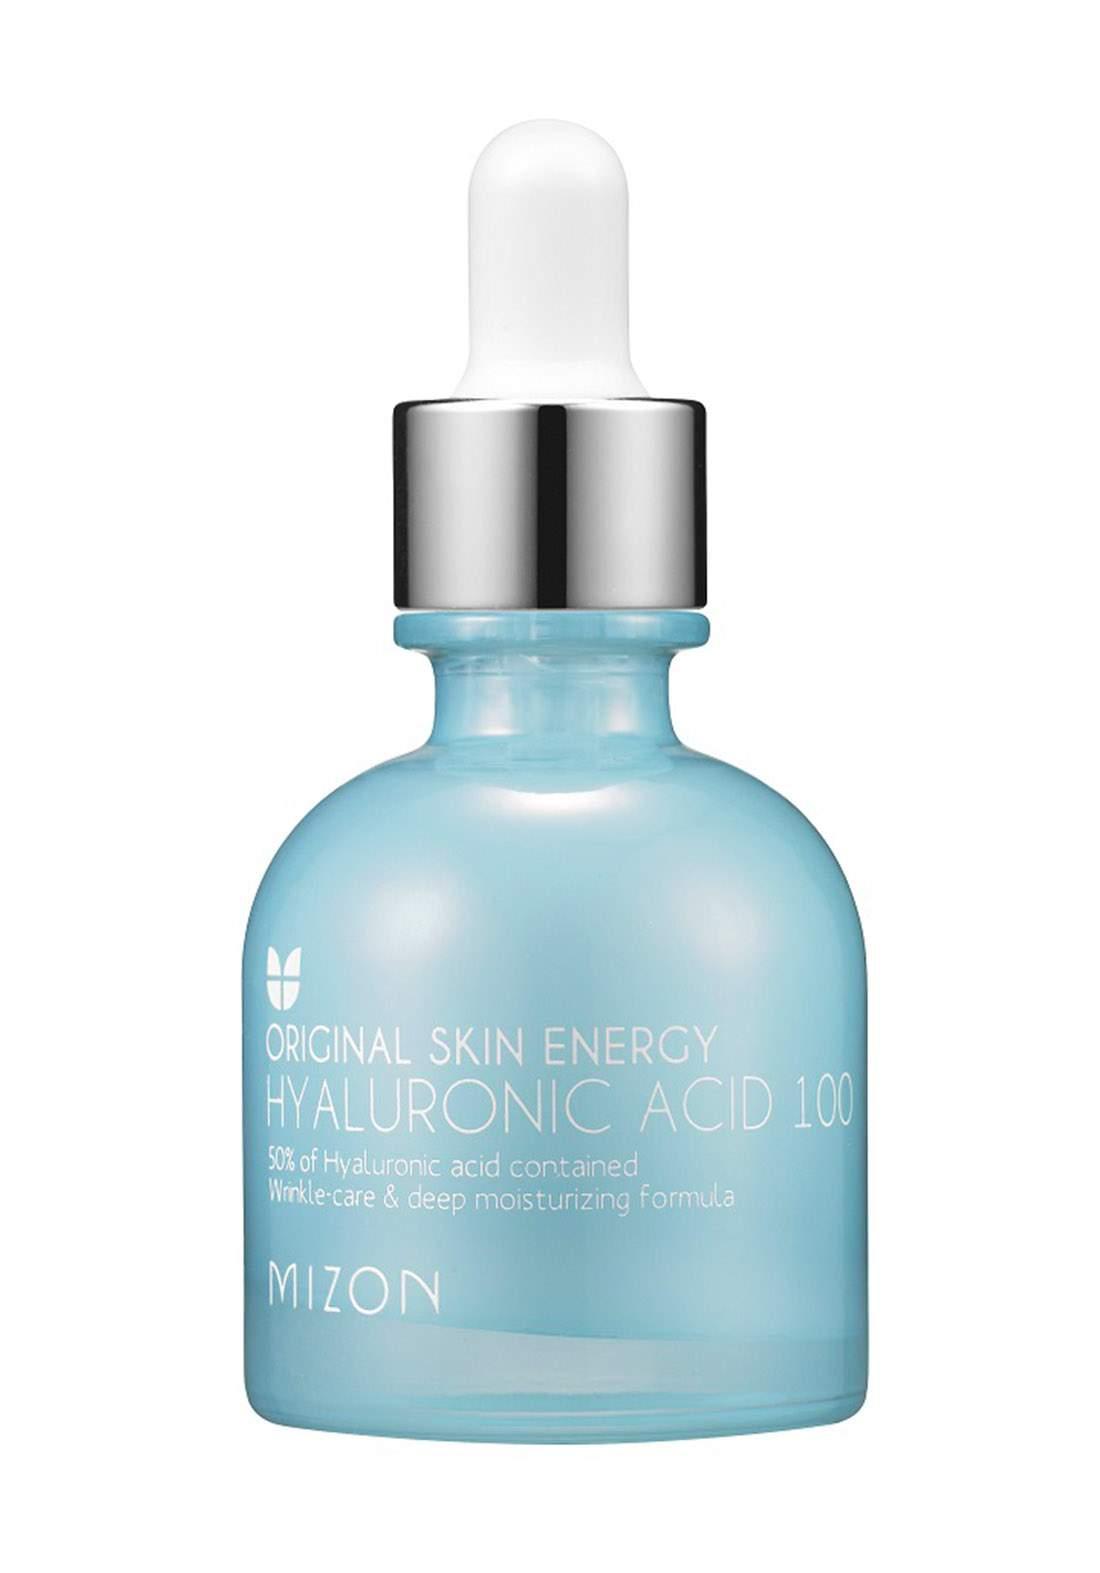 Mizon Hyaluronic Acid 100 30ml سيروم